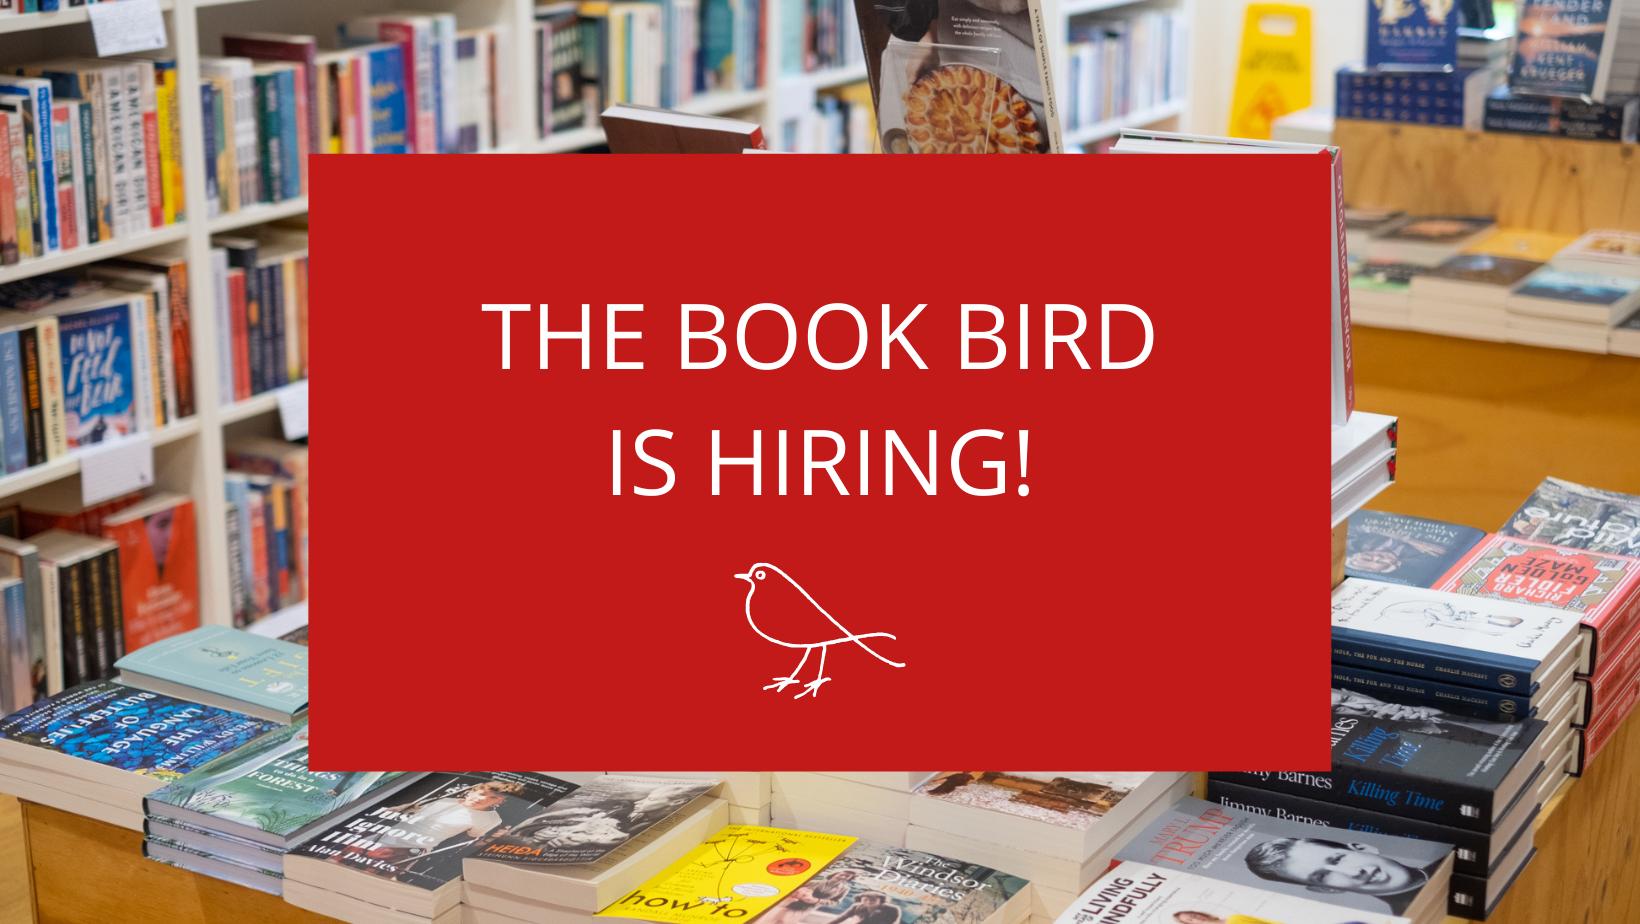 THE BOOK BIRD IS HIRING